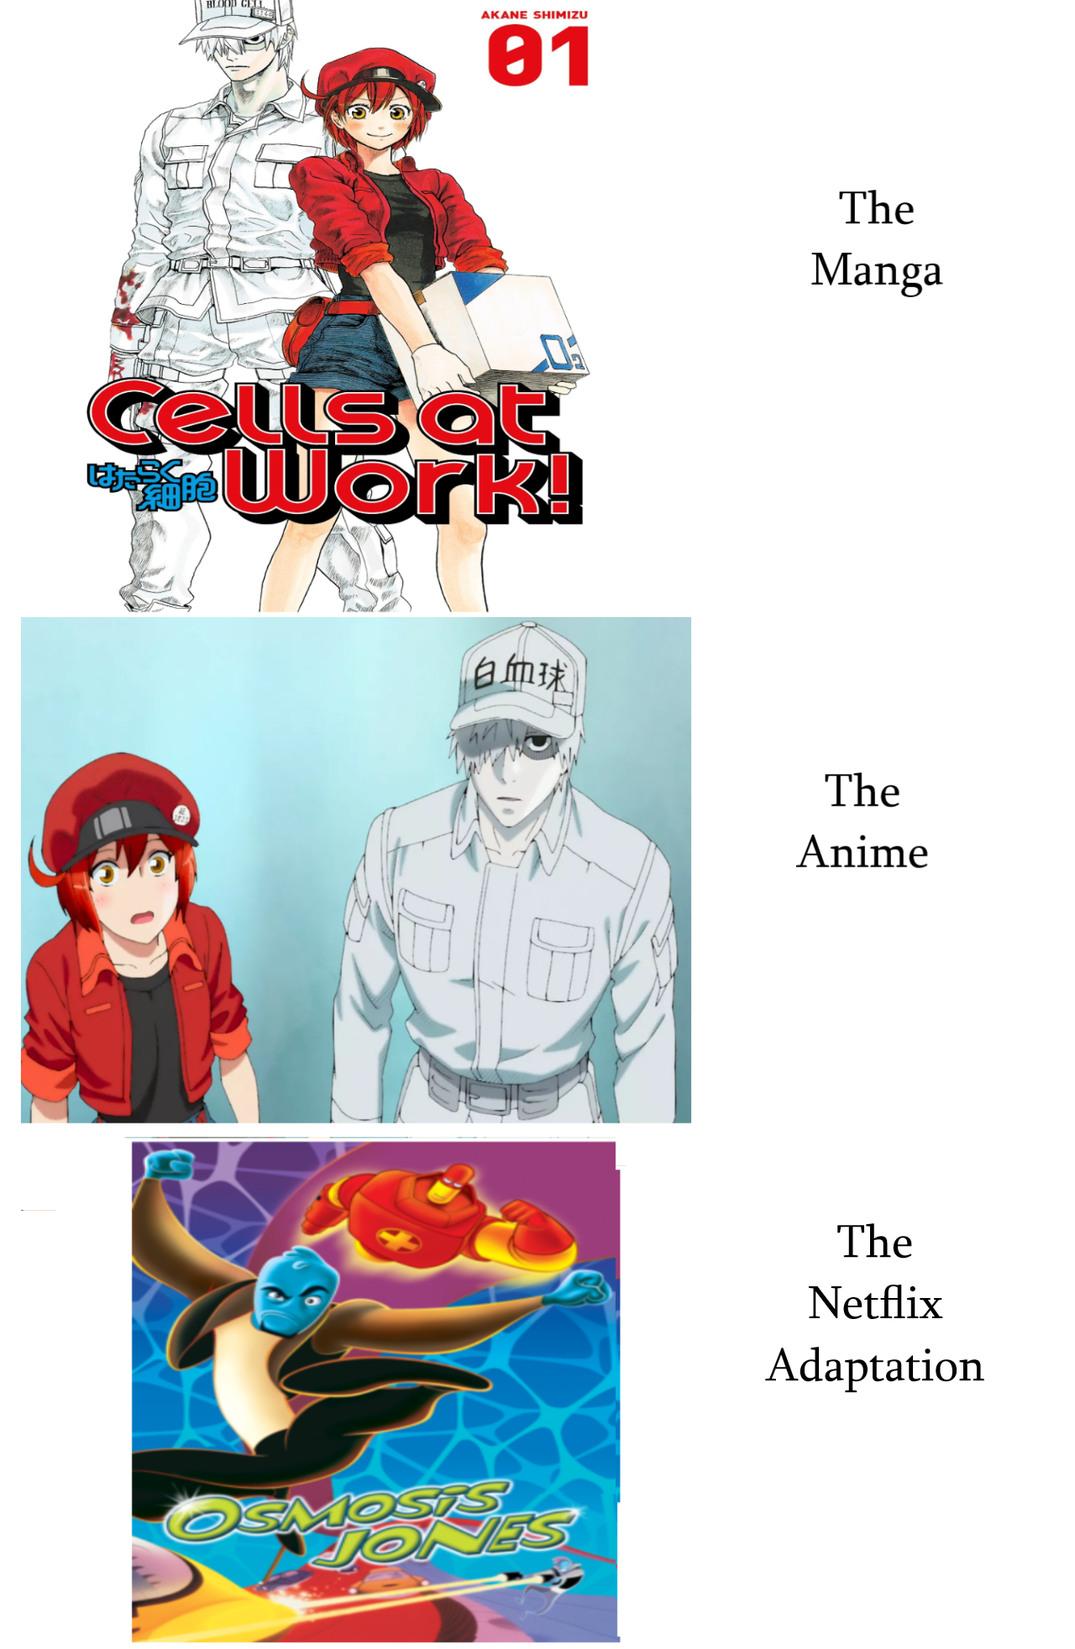 Anime Osmosis Jones, Netflix Cells at Work - meme